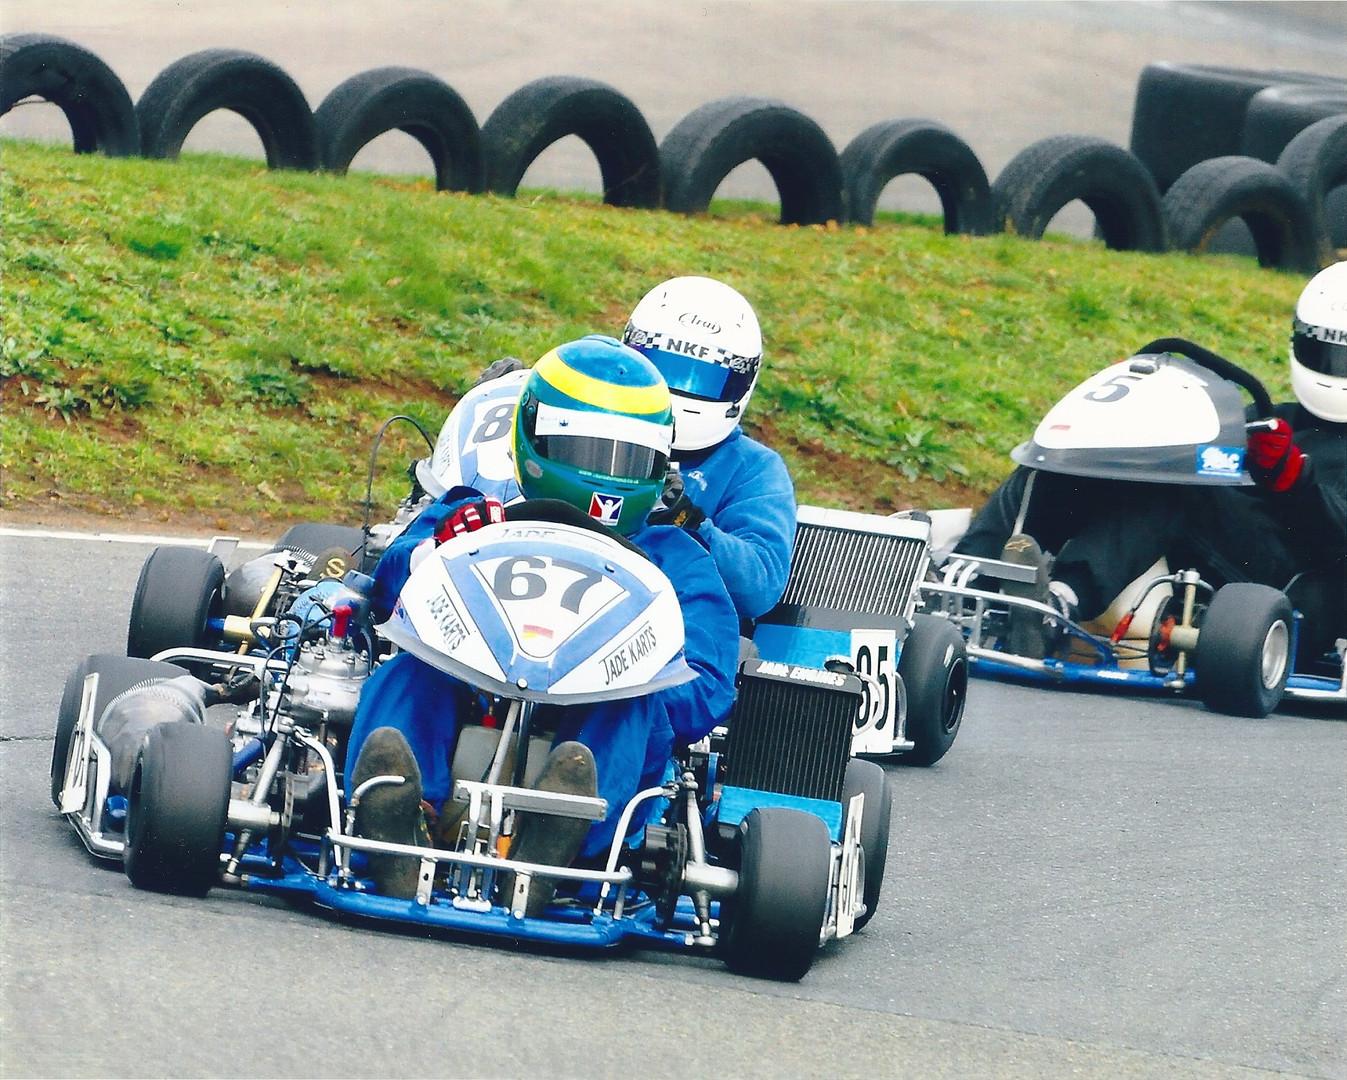 250 Gearbox kart Shenington kart club